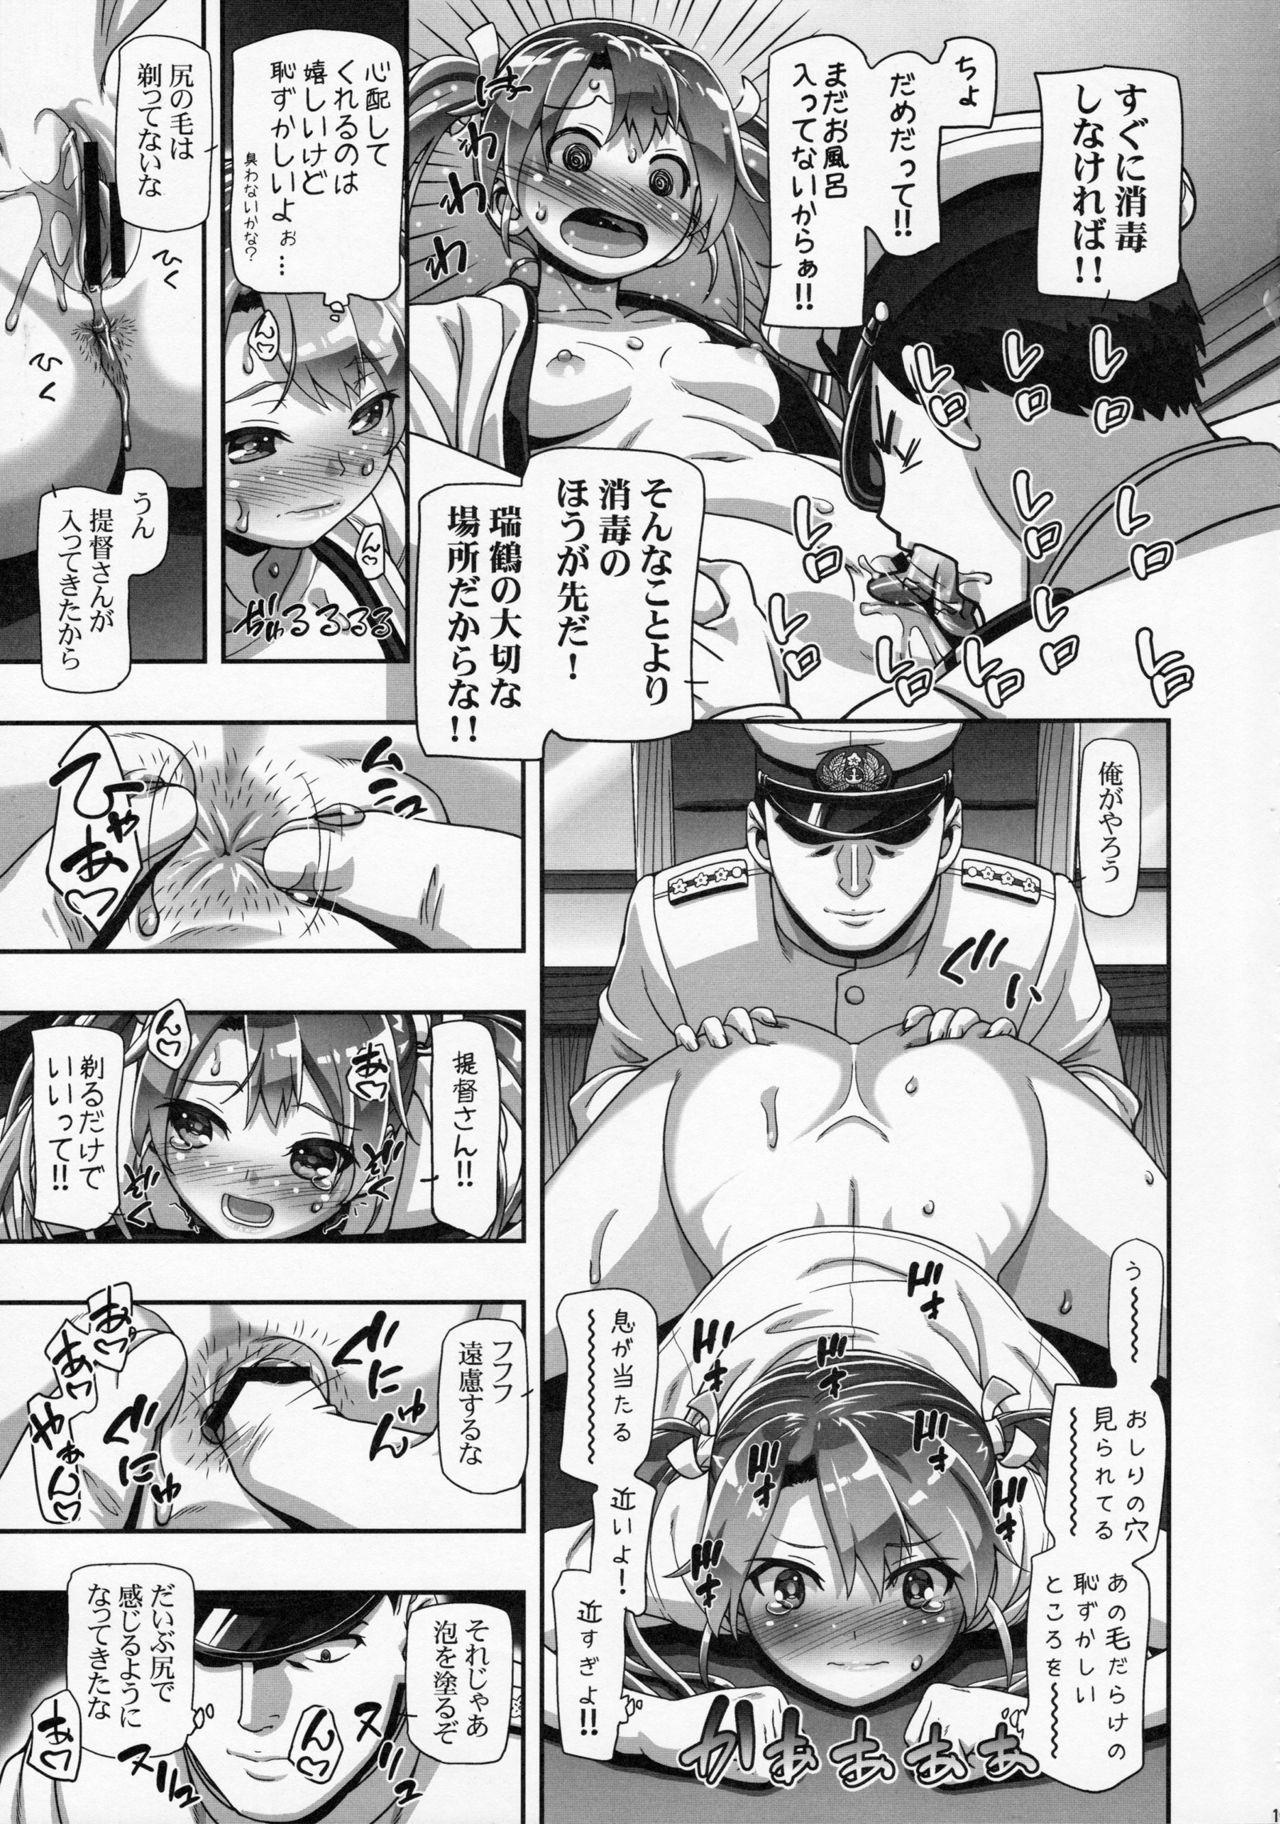 (COMIC1☆10) [Gambler Club (Kousaka Jun)] Teimou Kantai - Teitoku-san! Chikuchiku surun dakedo!! (Kantai Collection -KanColle-) 8